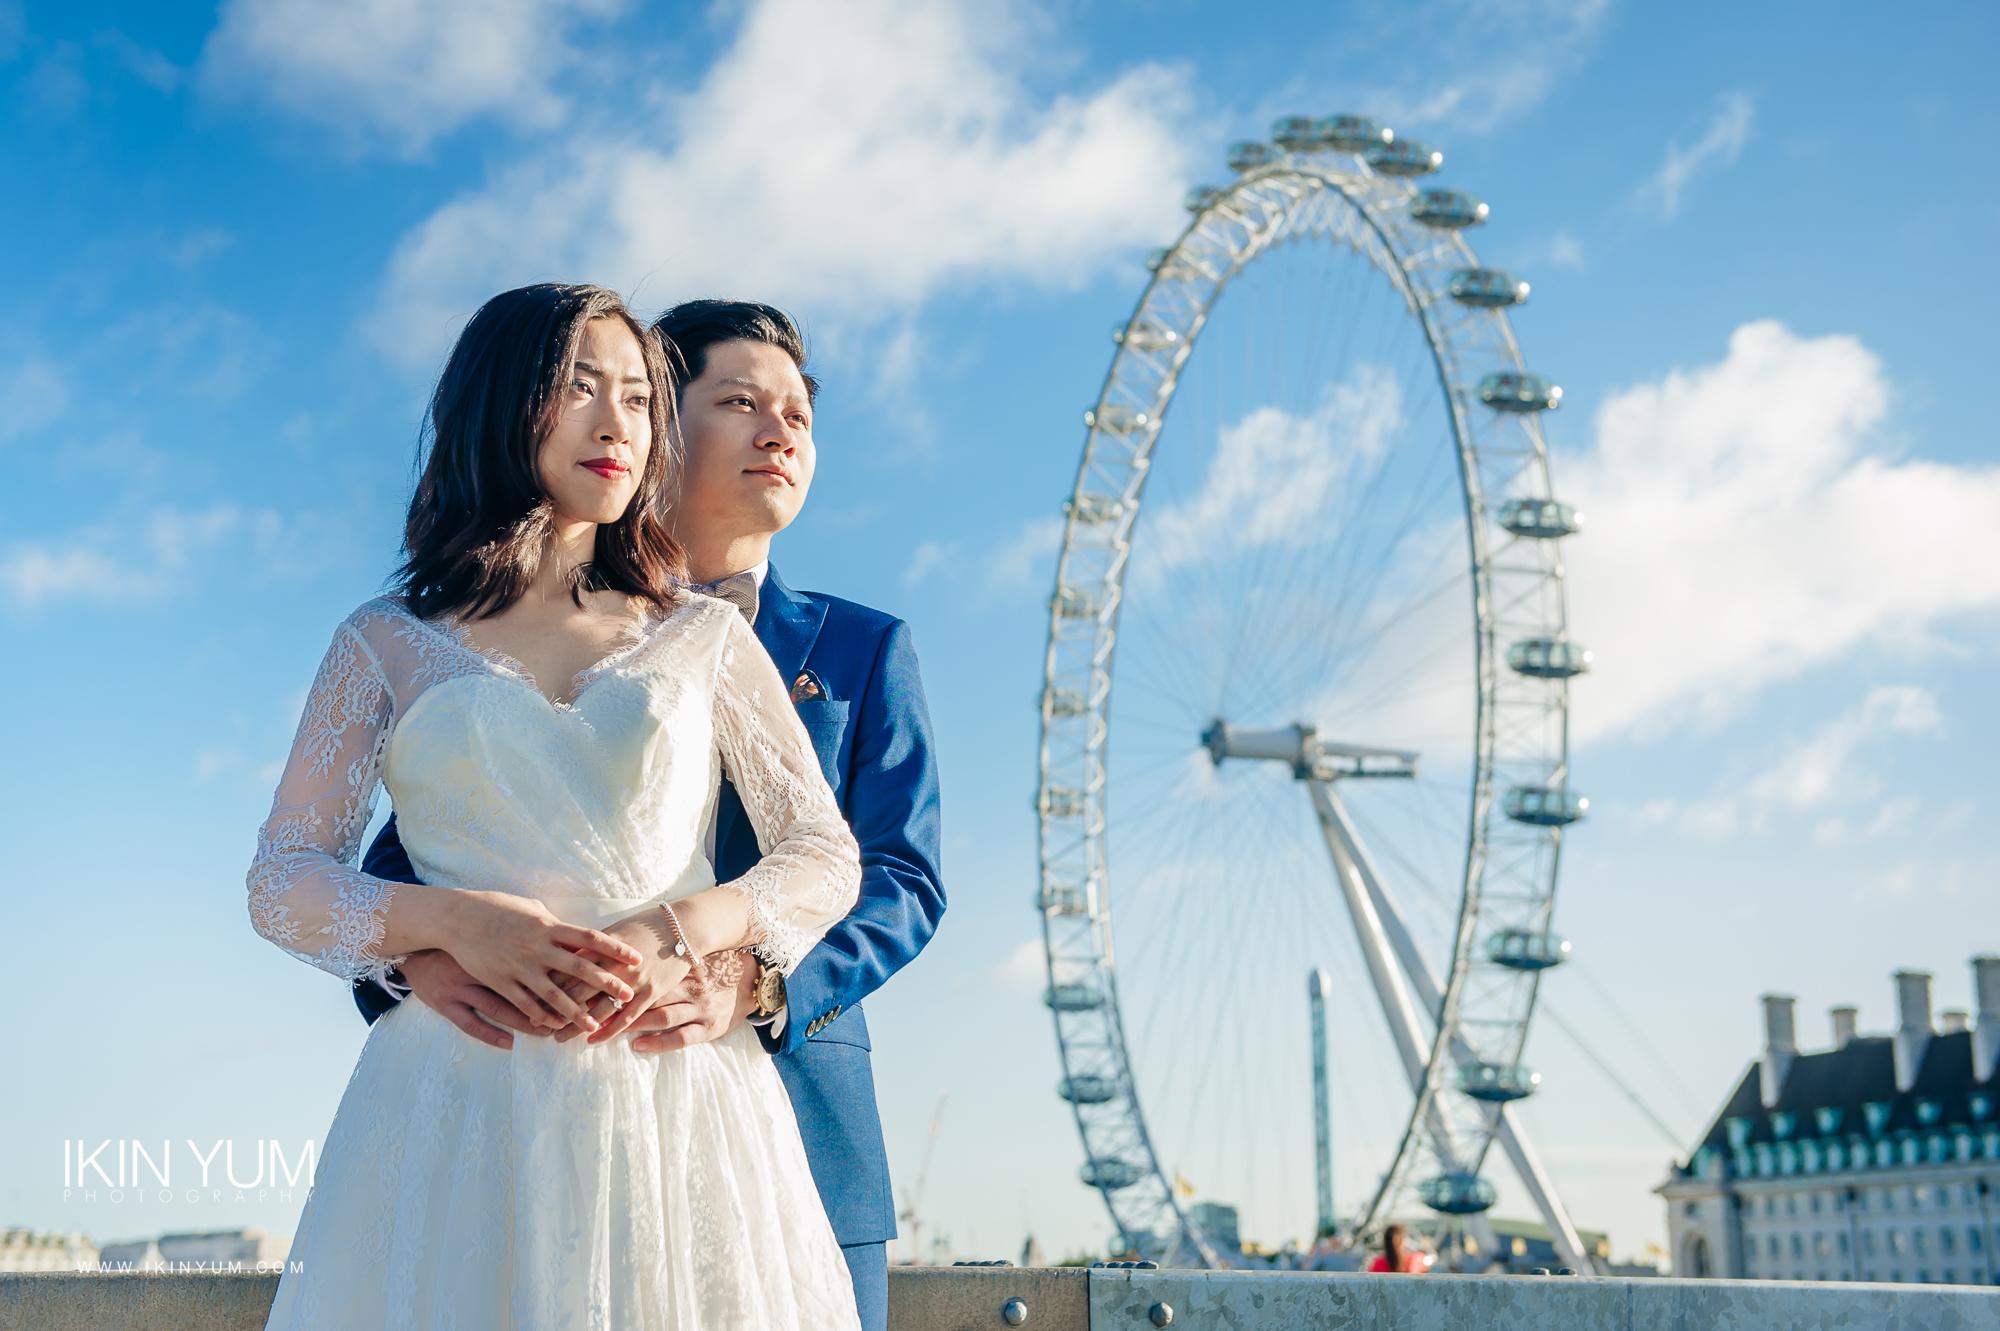 Natalie & Duncan Wedding Day - Ikin Yum Photography-006.jpg